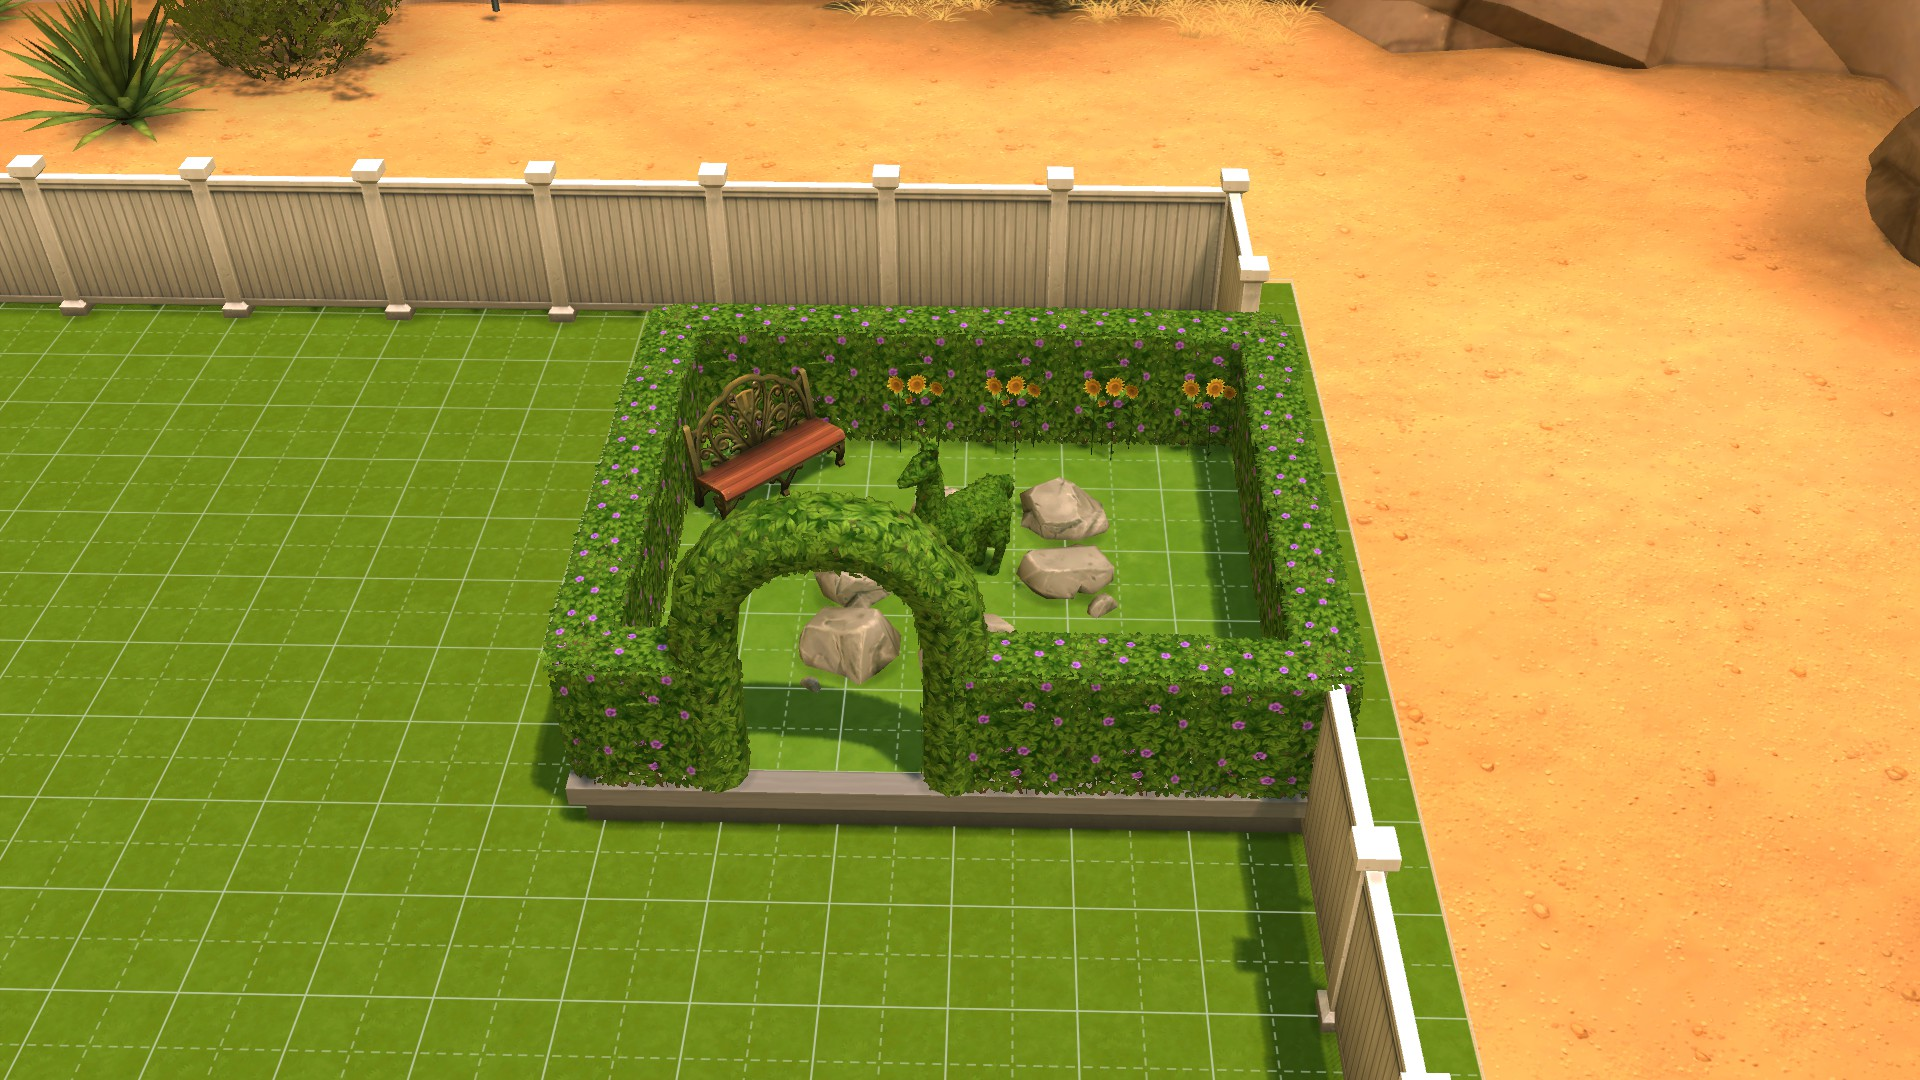 Les sims 4 construire sa maison 4 game guide for Exterieur sims 4